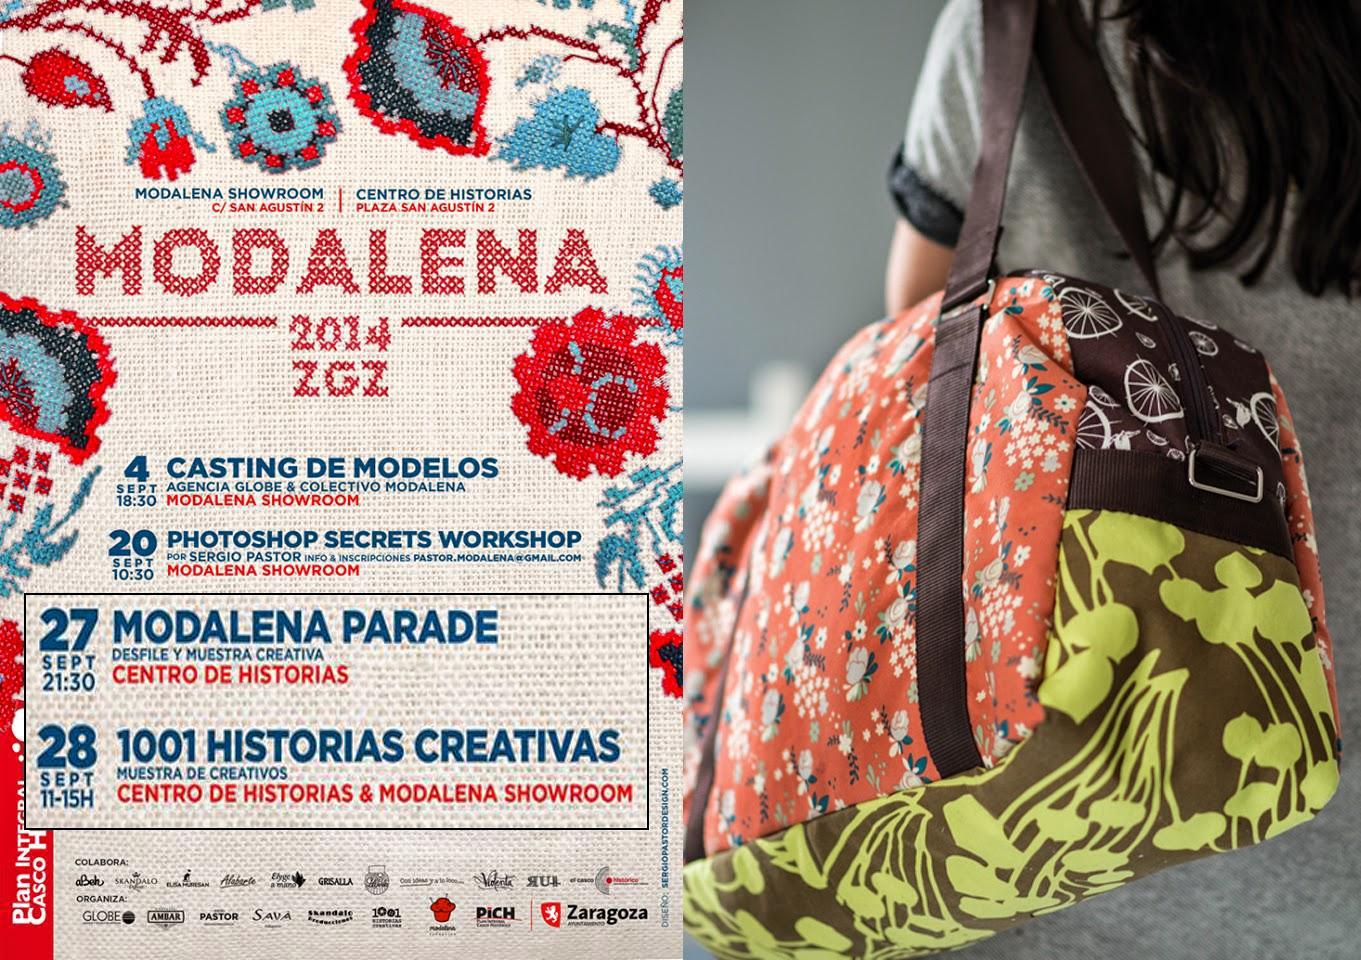 desfile modalena 2014, 1001 historias creativas, algodon ecologico